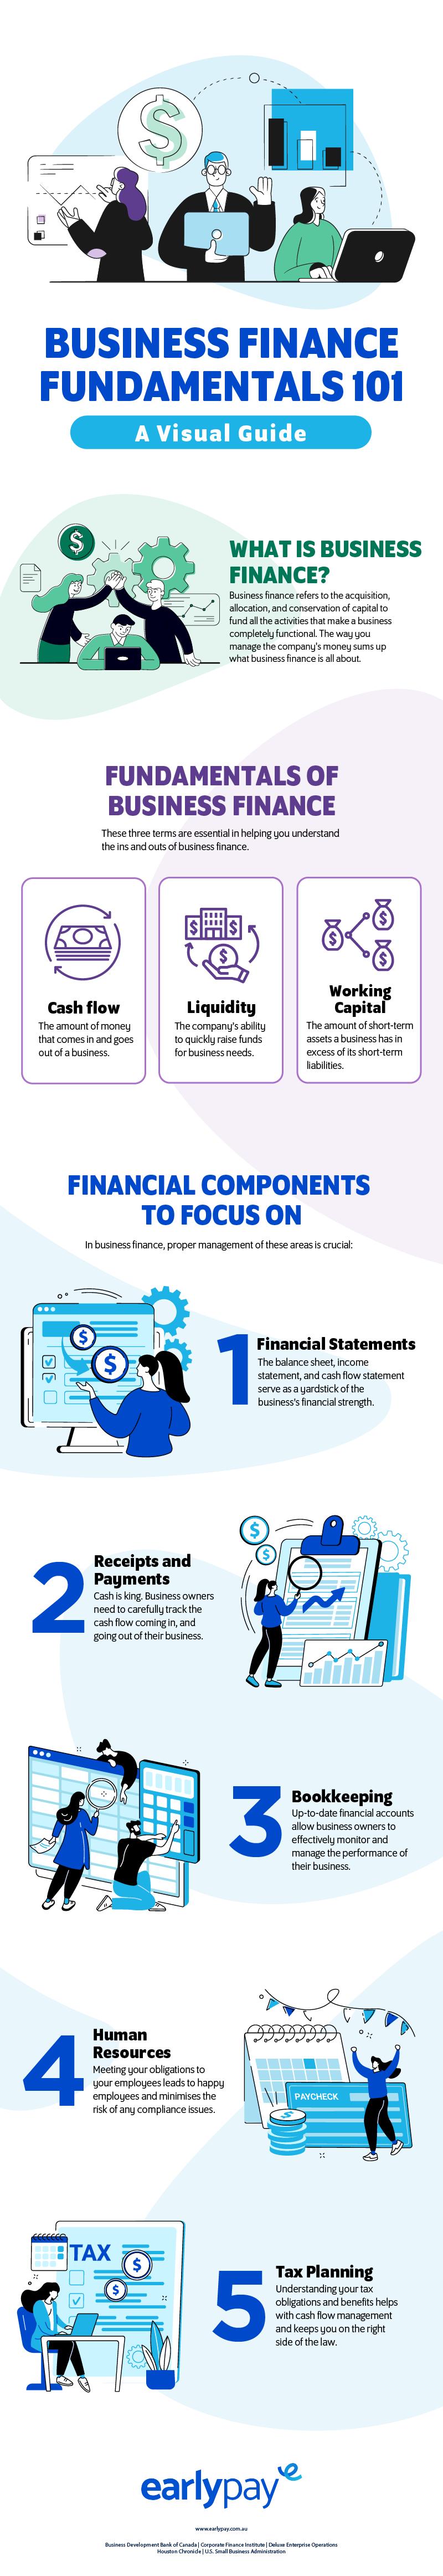 Business Finance Fundamentals 101 A Visual Guide